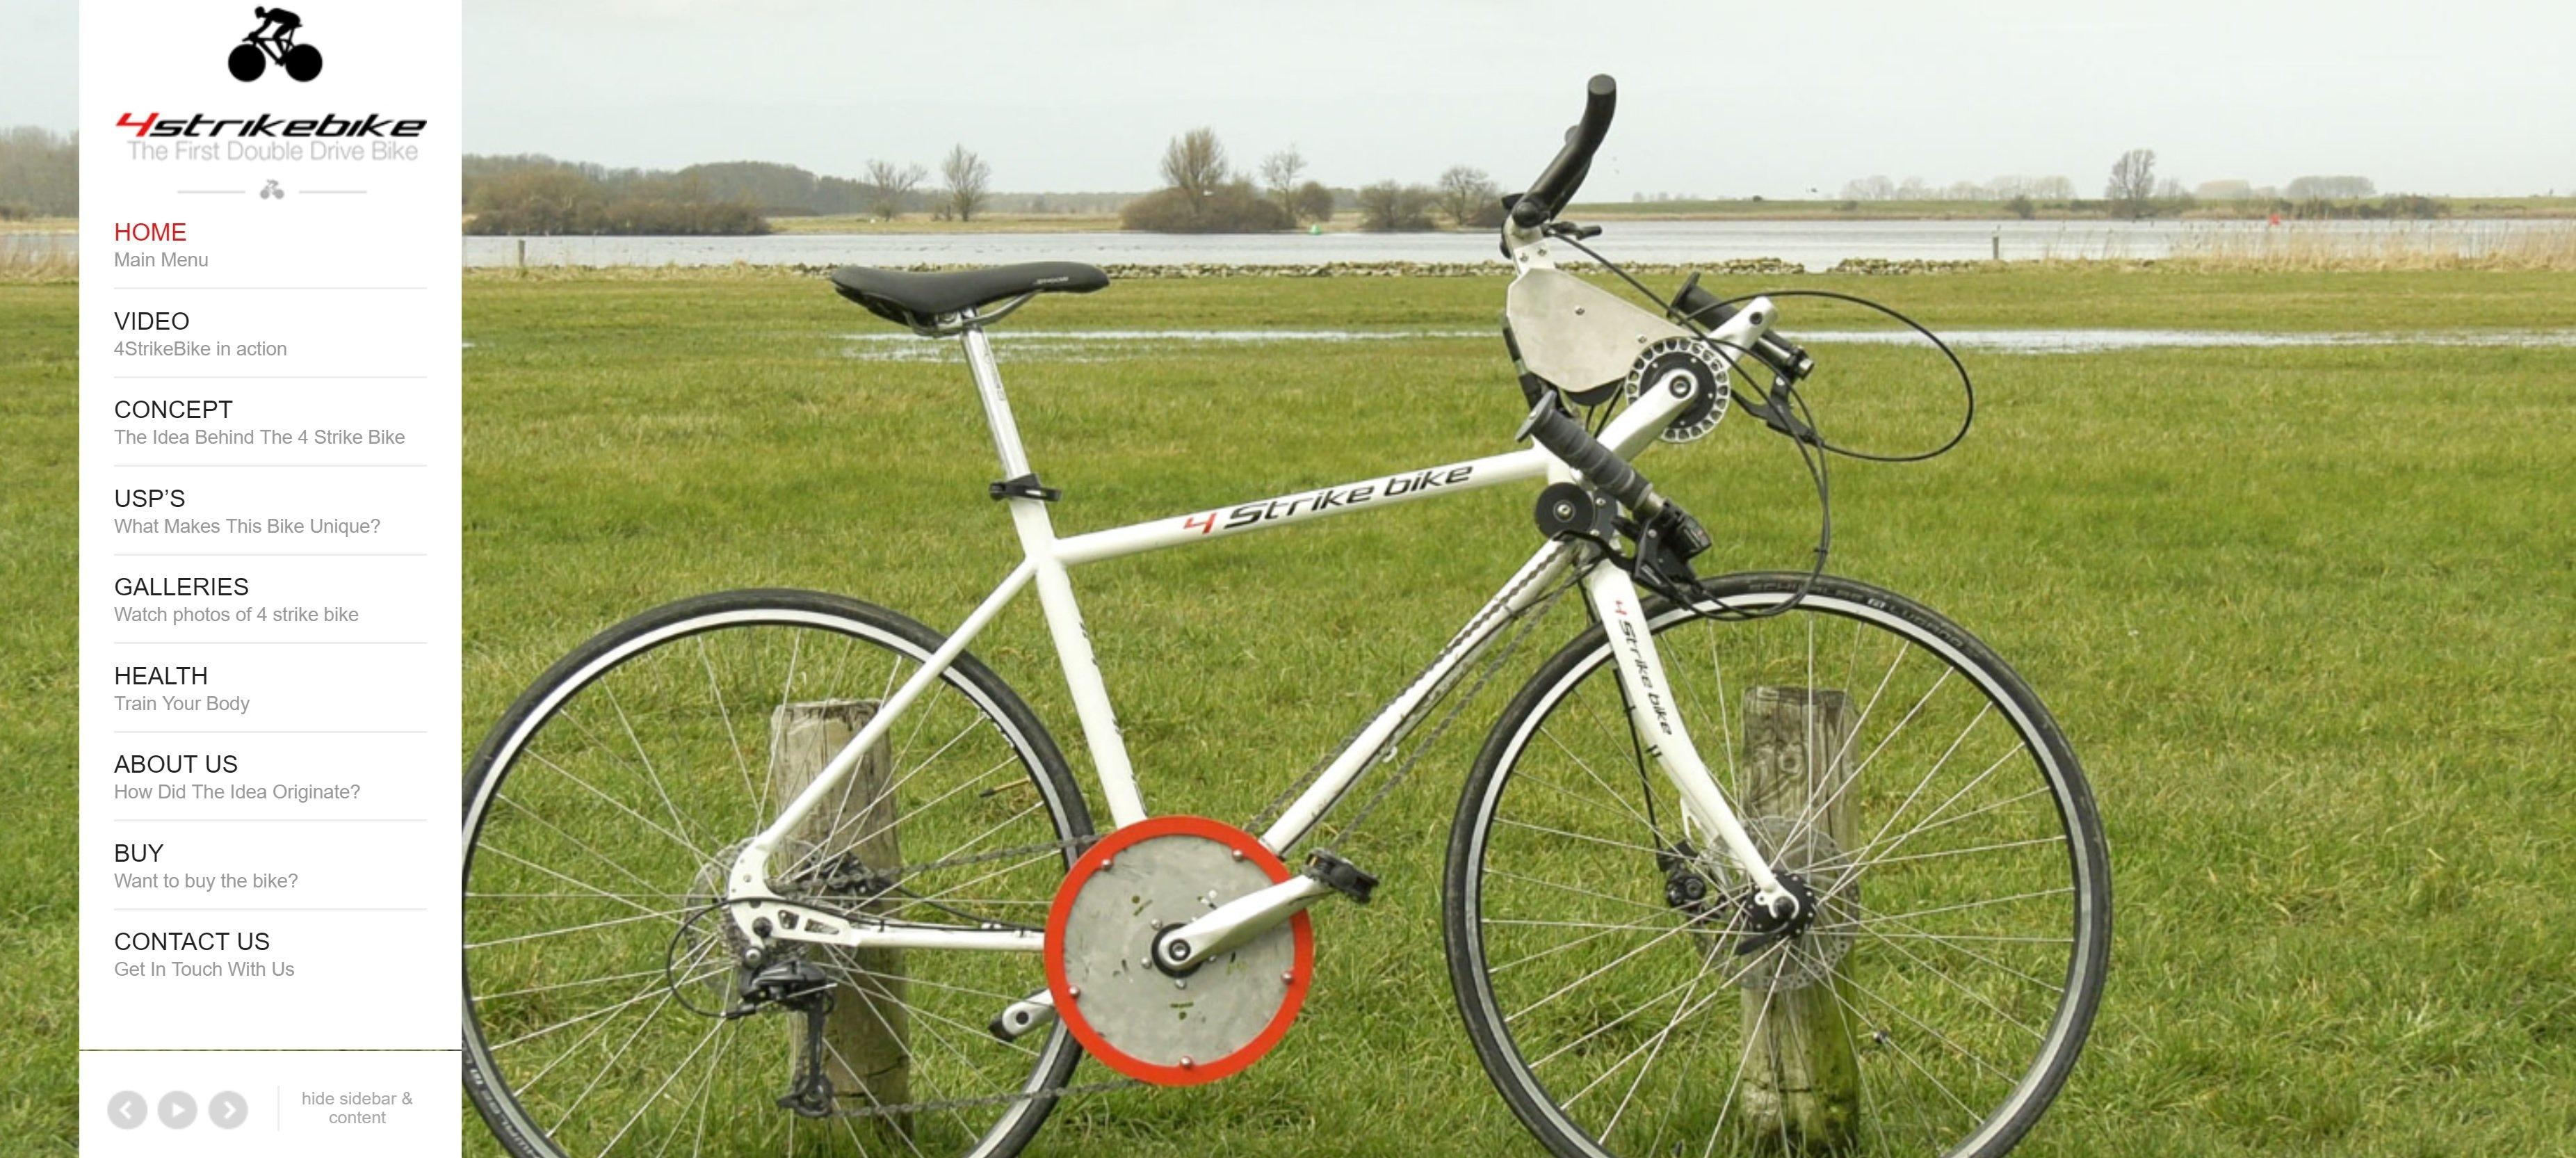 Onderhoud 4 Strike Bike